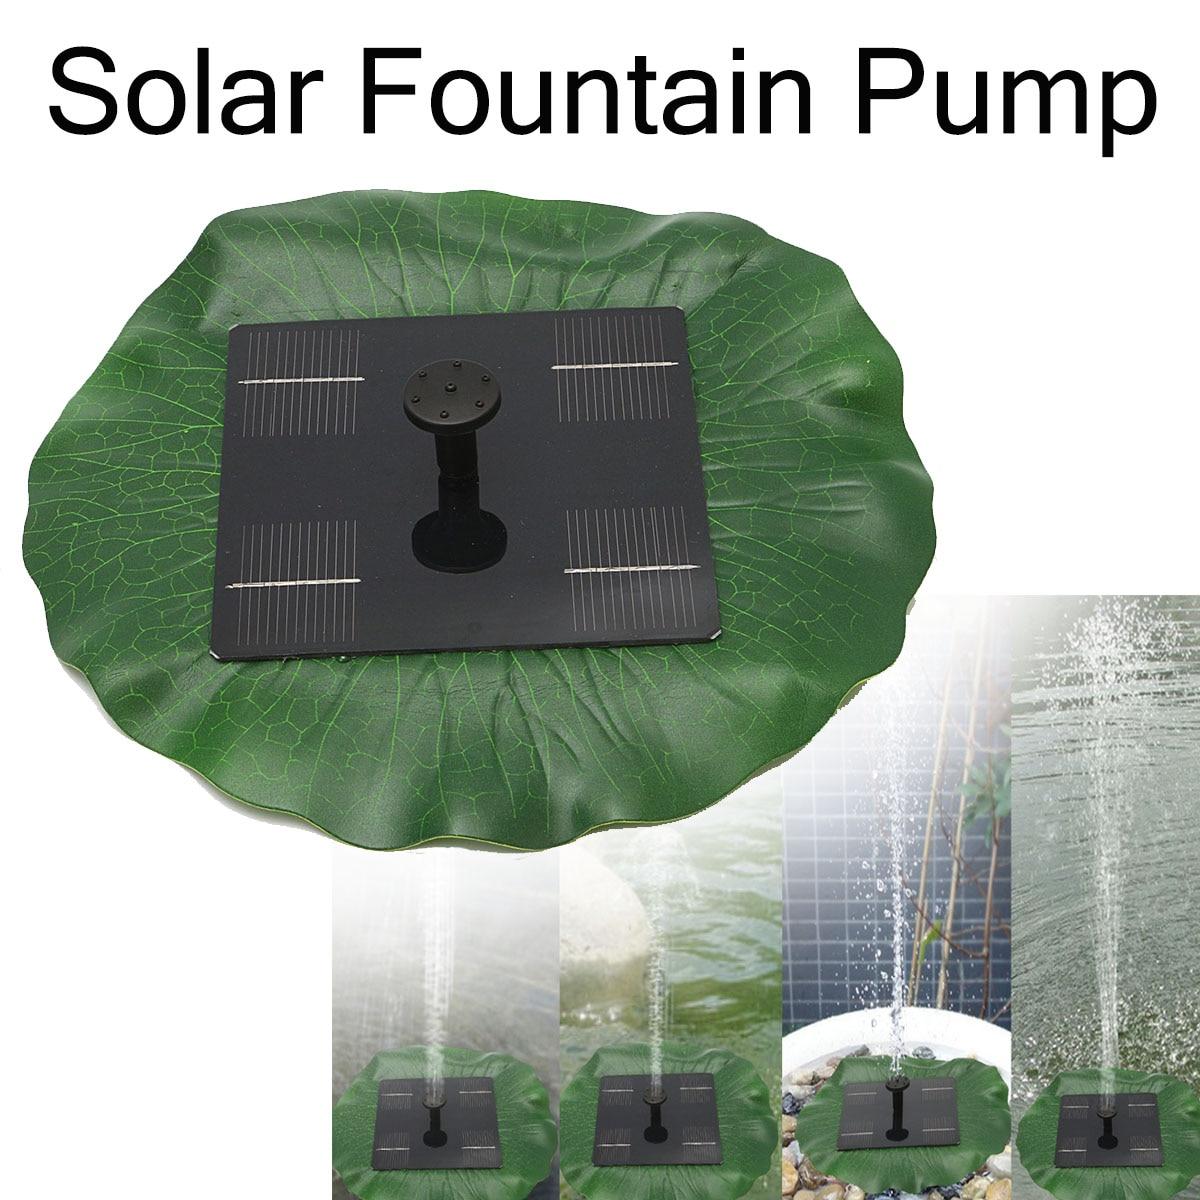 8V 1.6W 180L/h Floating Solar Power Fountain Panel Kit Garden Water Pump for Birdbath Pool Watering Wide Irrigation Pumps цены онлайн